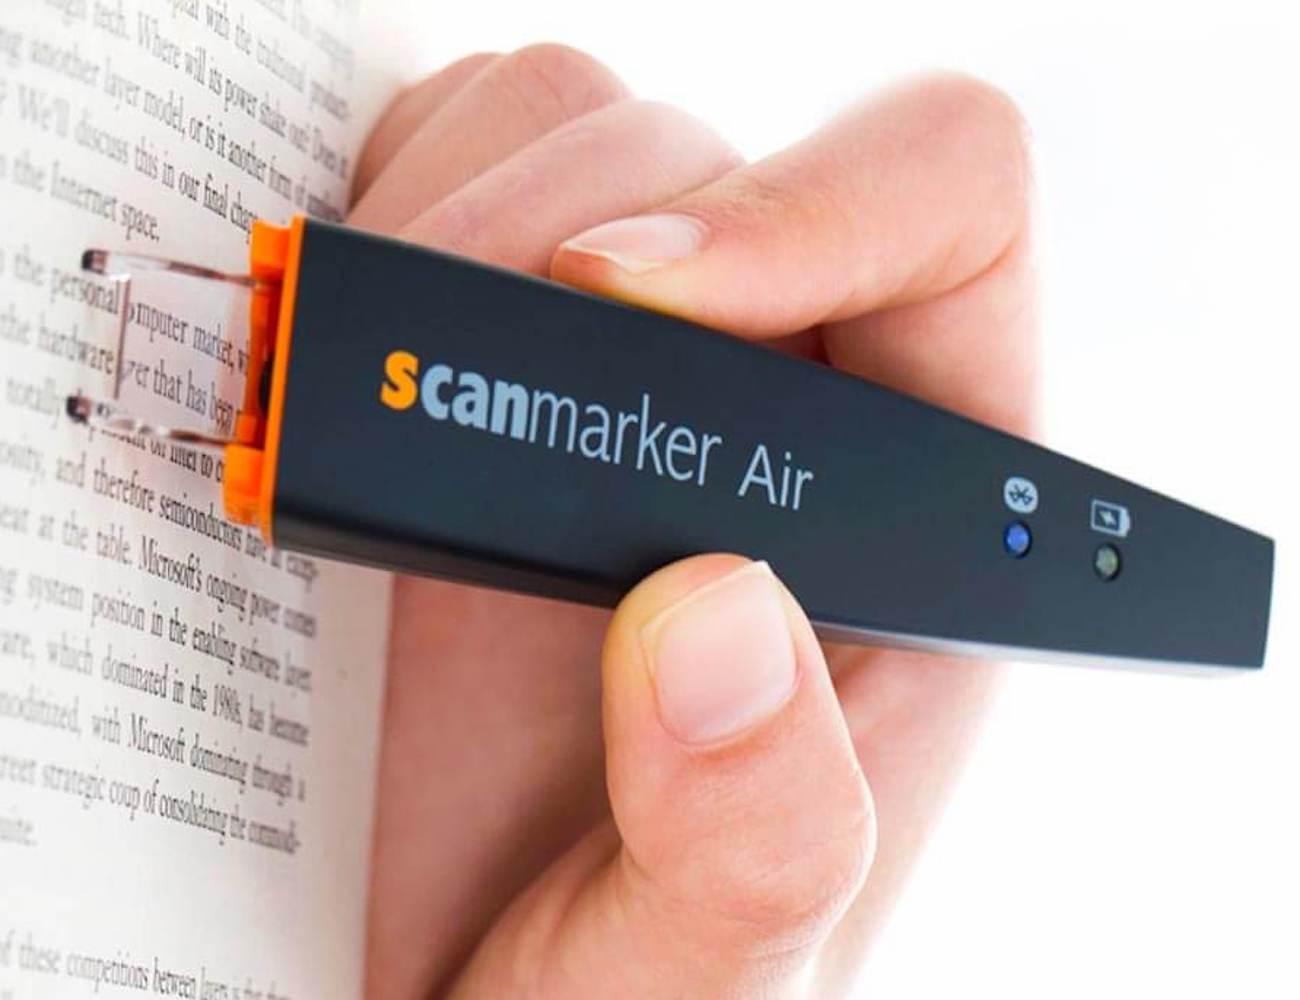 ScanMarker Air Digital Highlighter Pen